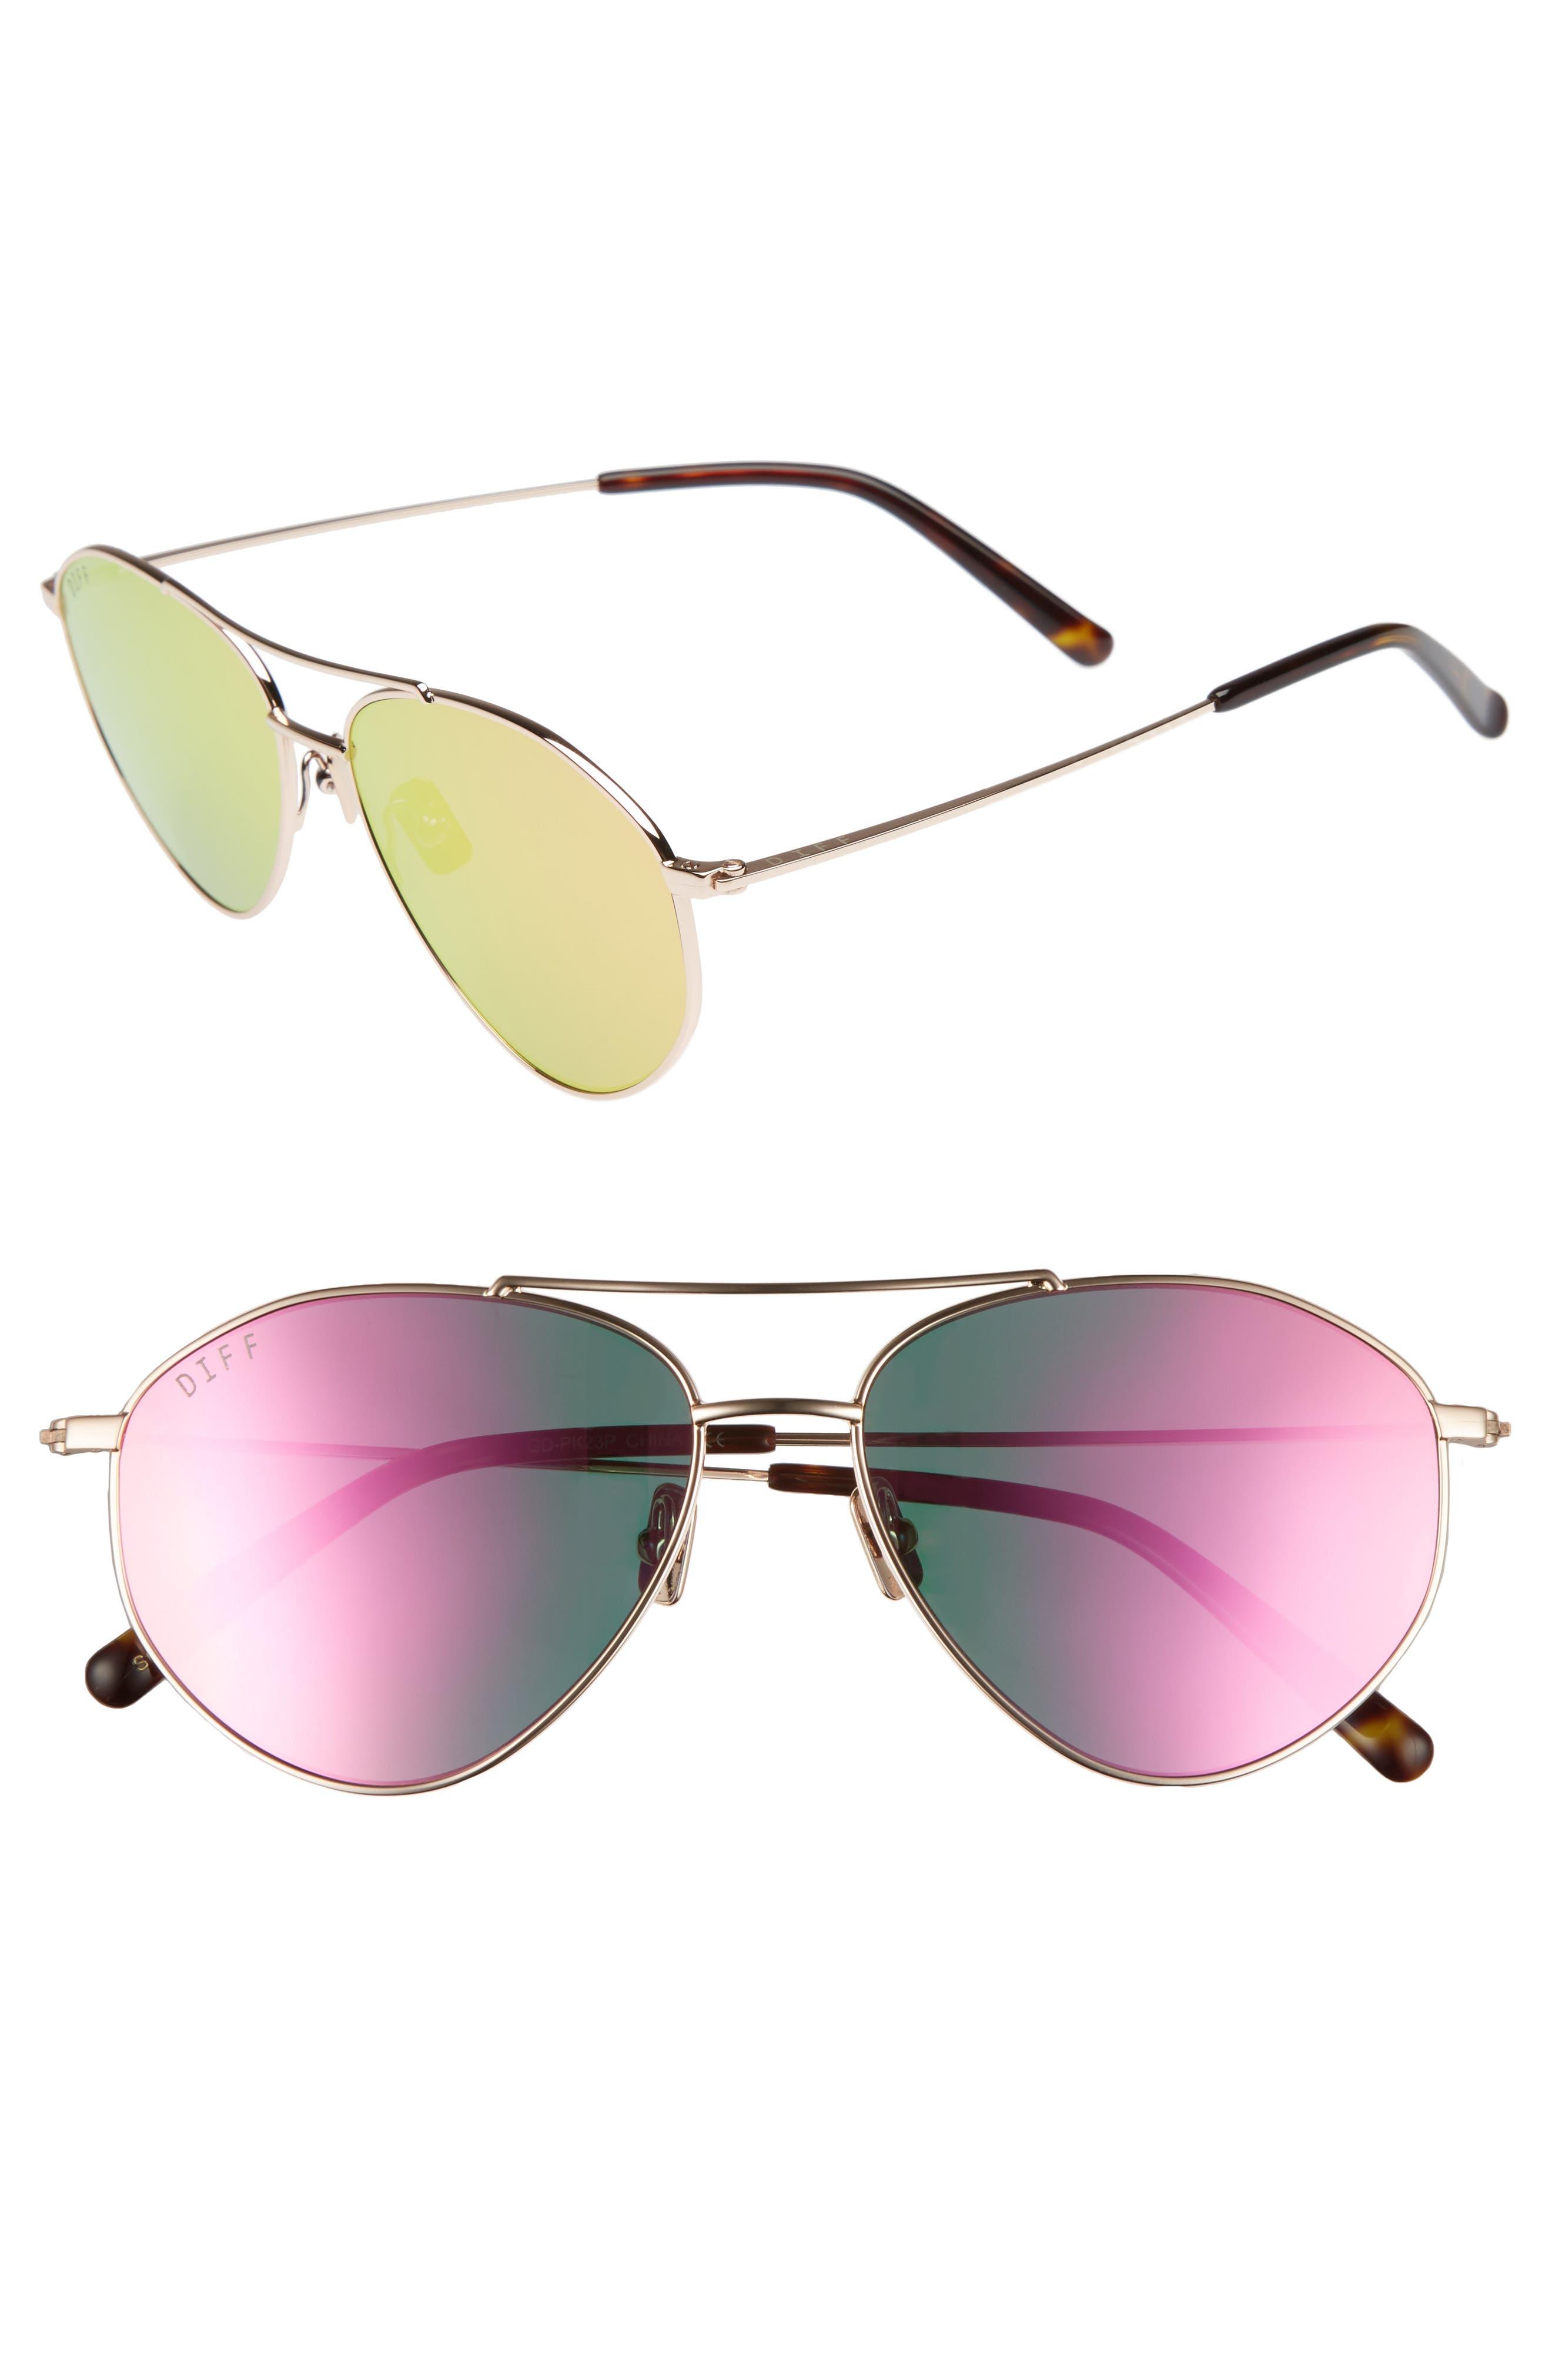 DIFF Scout 53mm Aviator Sunglasses